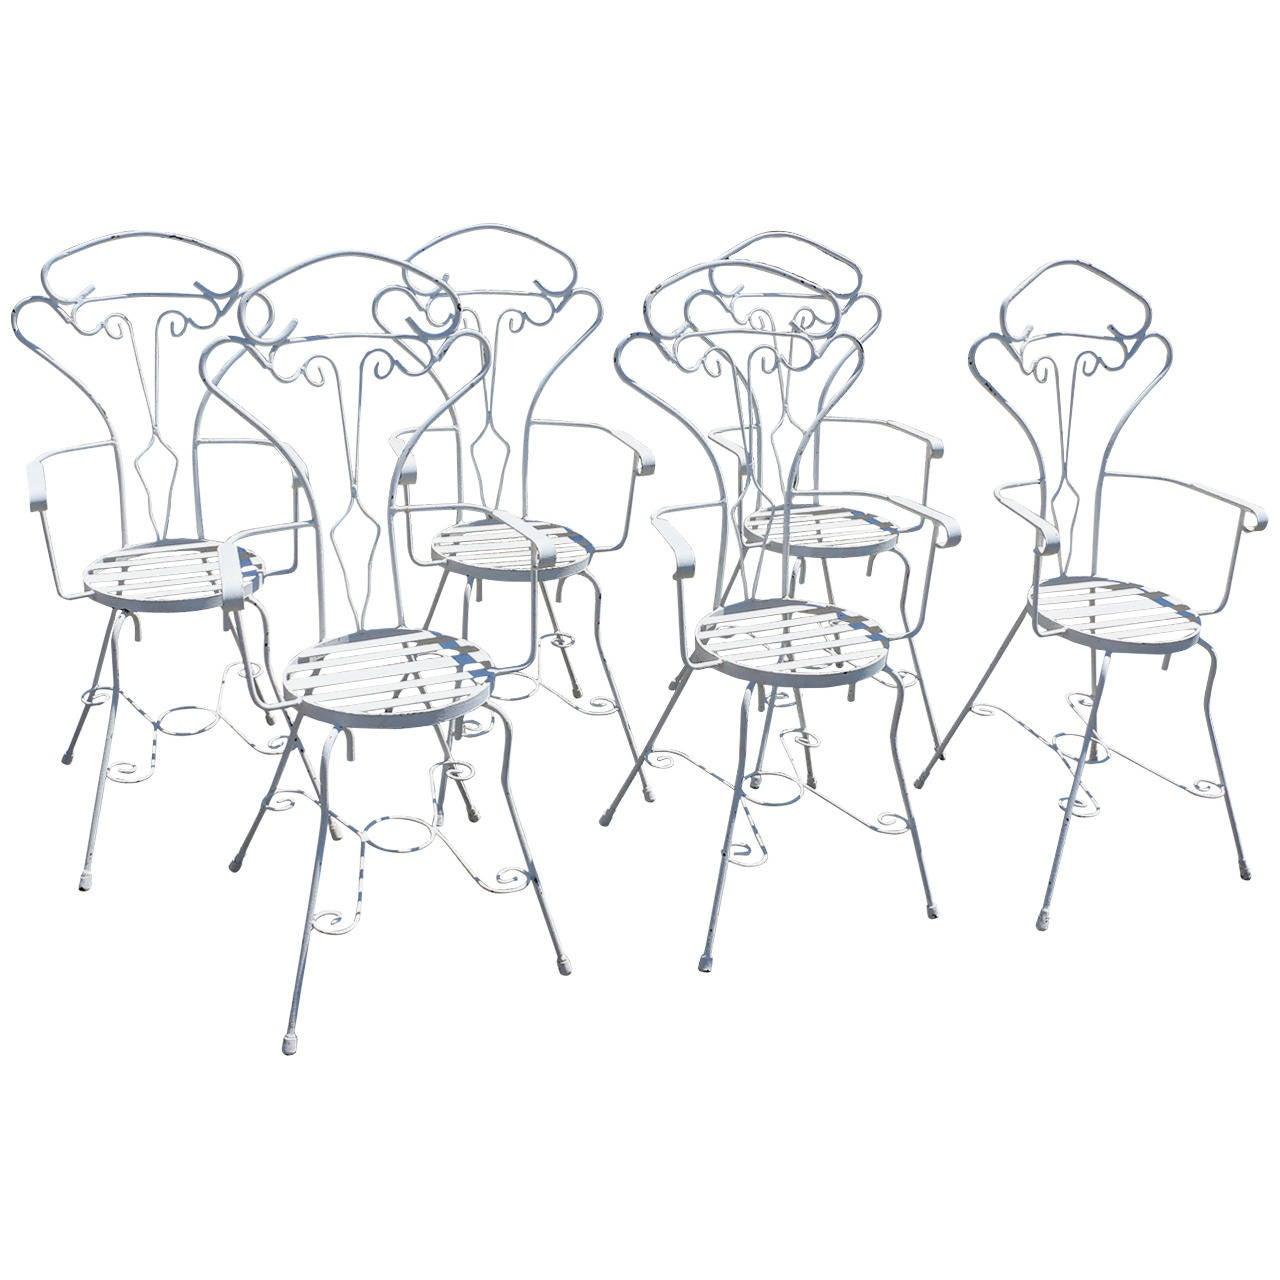 Garden Set of Six Anthropomorphic Iron Chairs